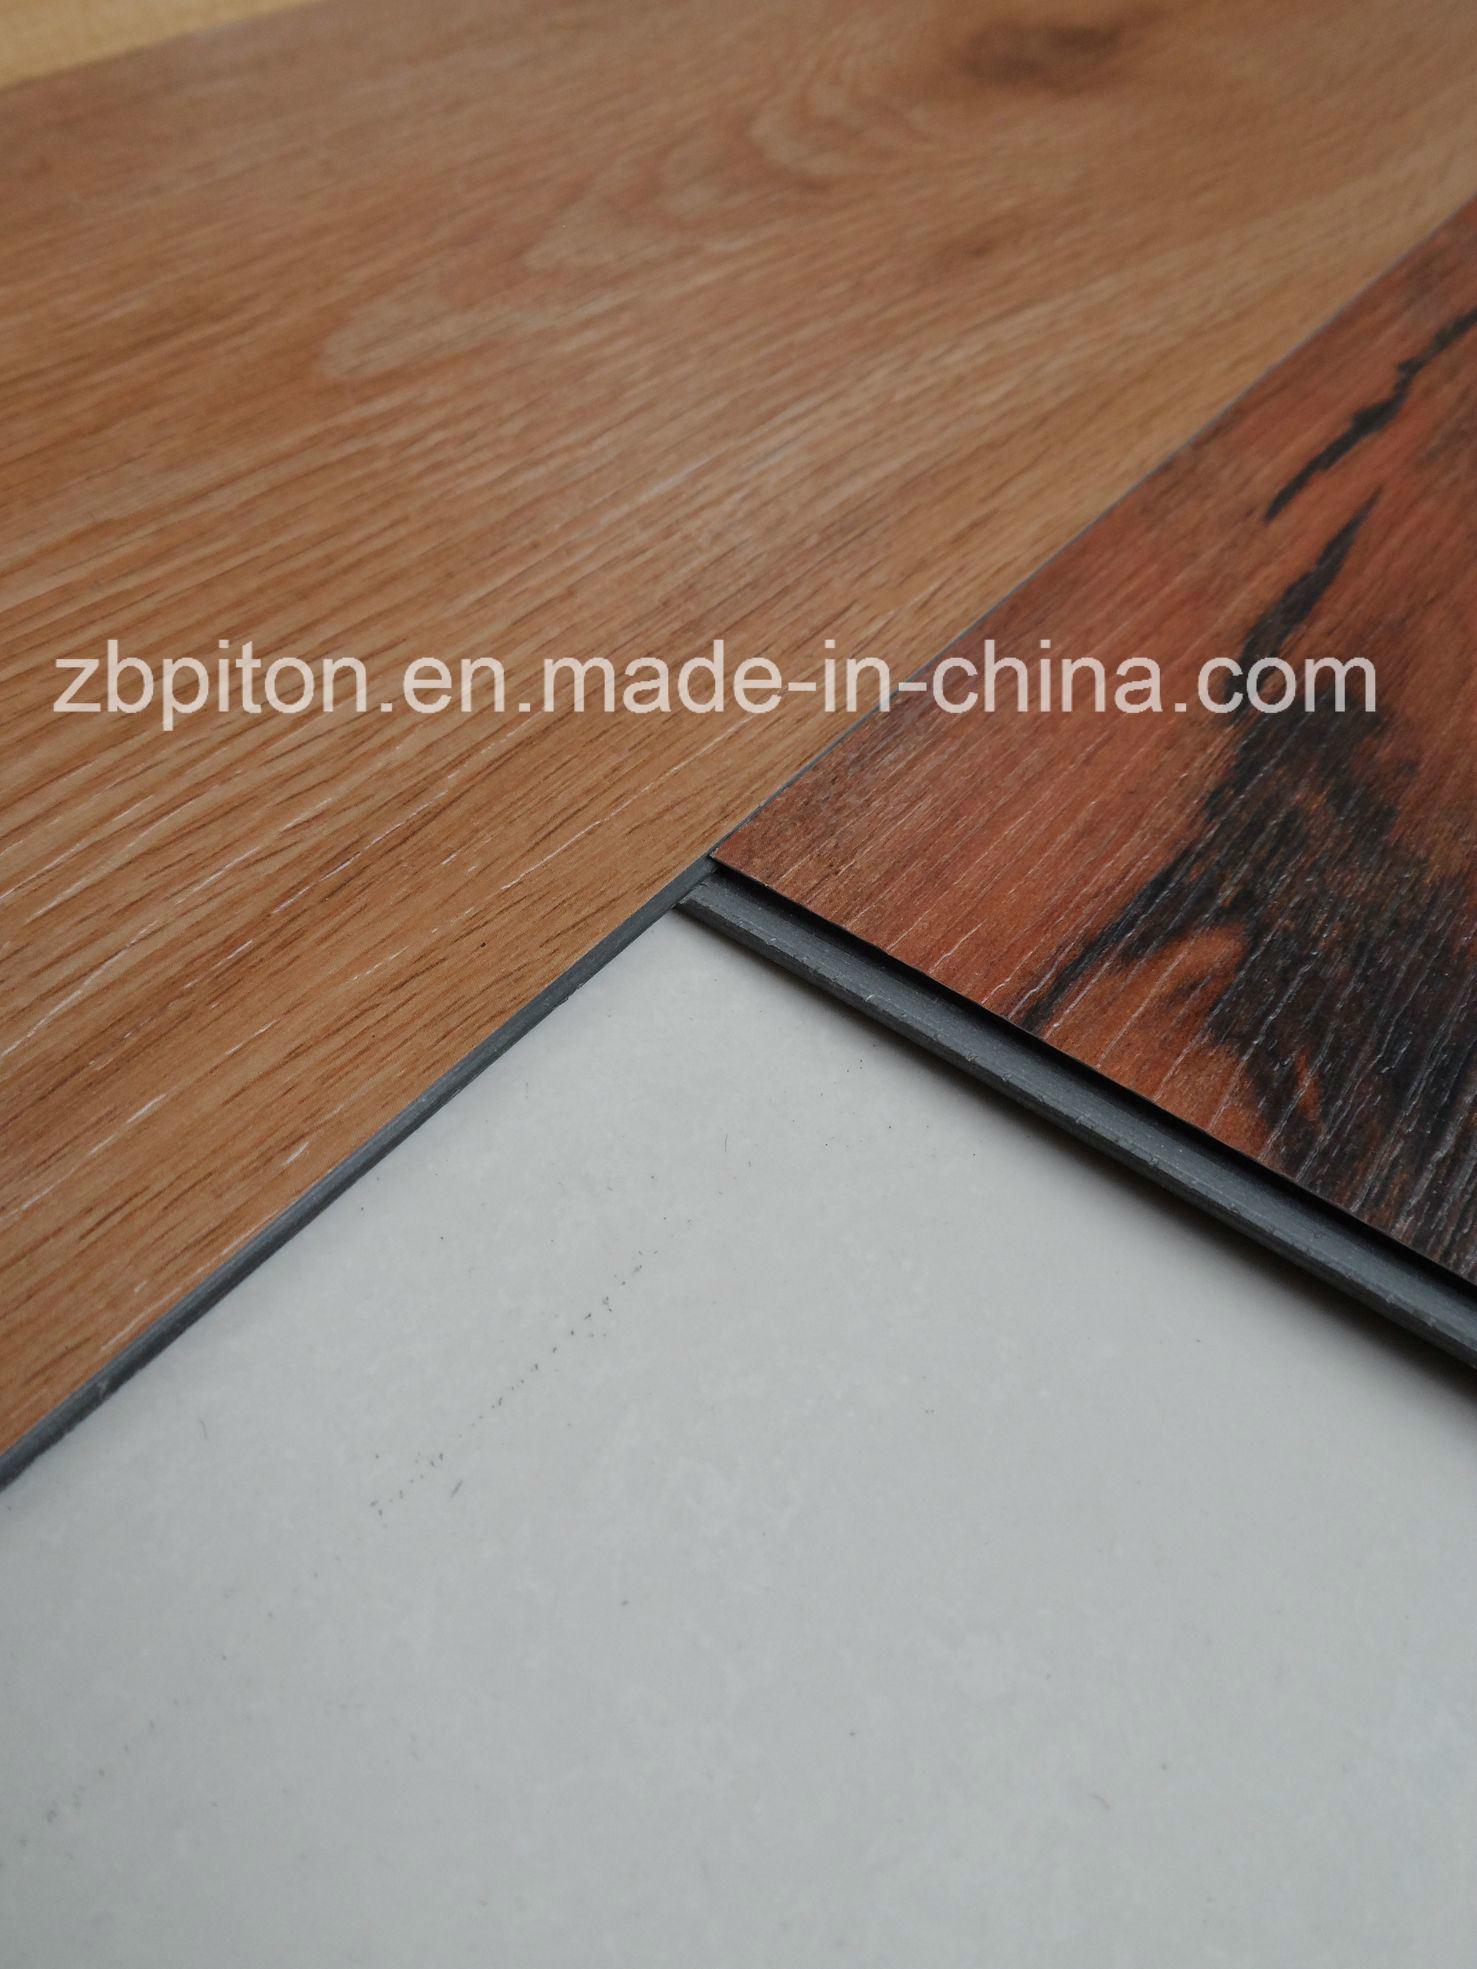 China interlocking plastic floor tile lvt pvc vinyl planks interlocking plastic floor tile lvt pvc vinyl planks cng0256n doublecrazyfo Images